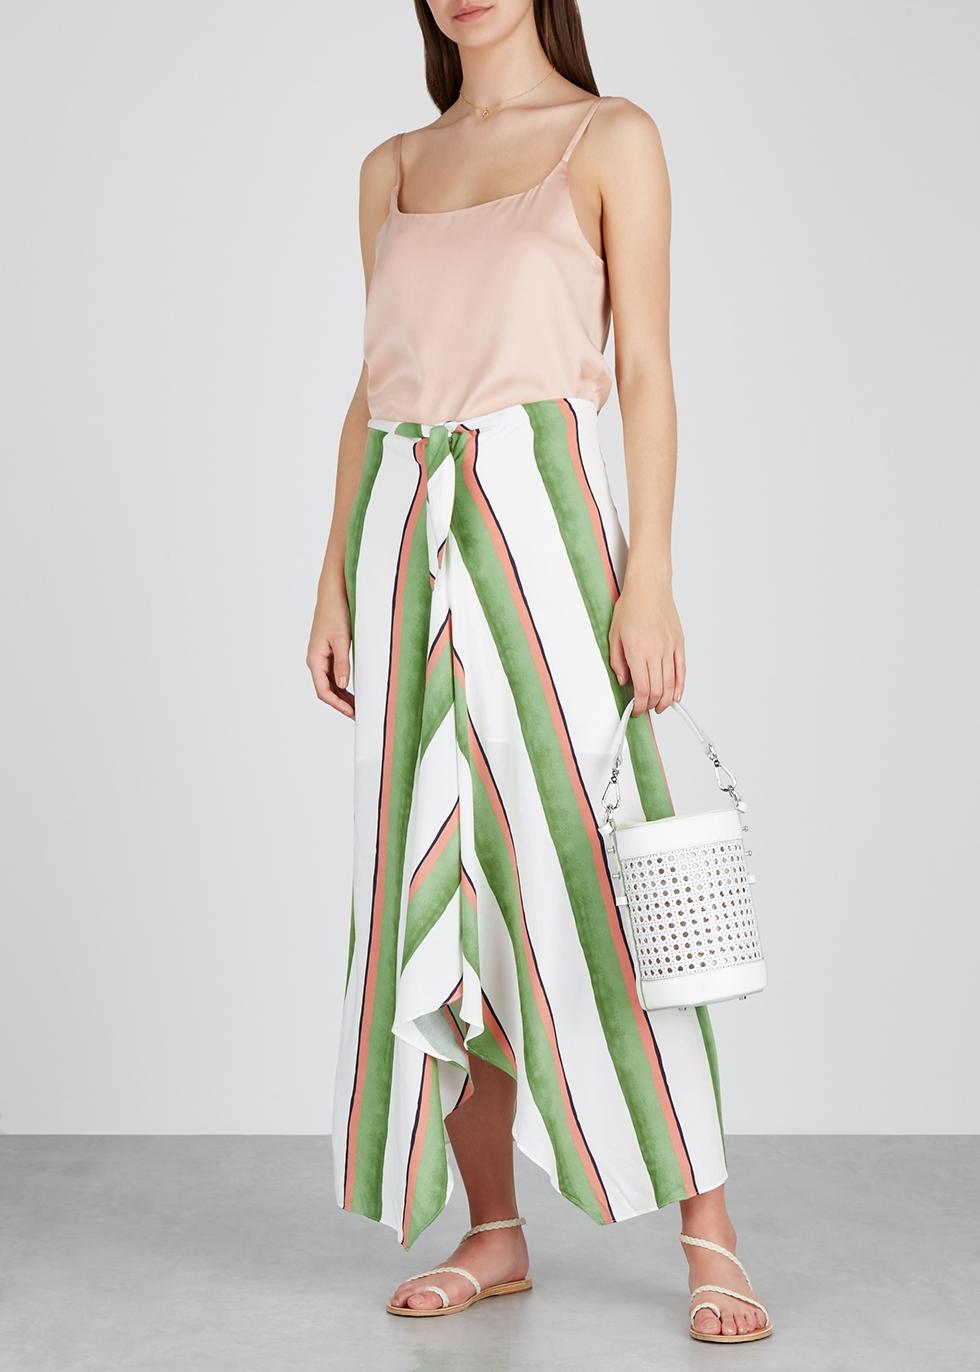 Calala Jaque striped midi skirt - V i X Paula Hermanny